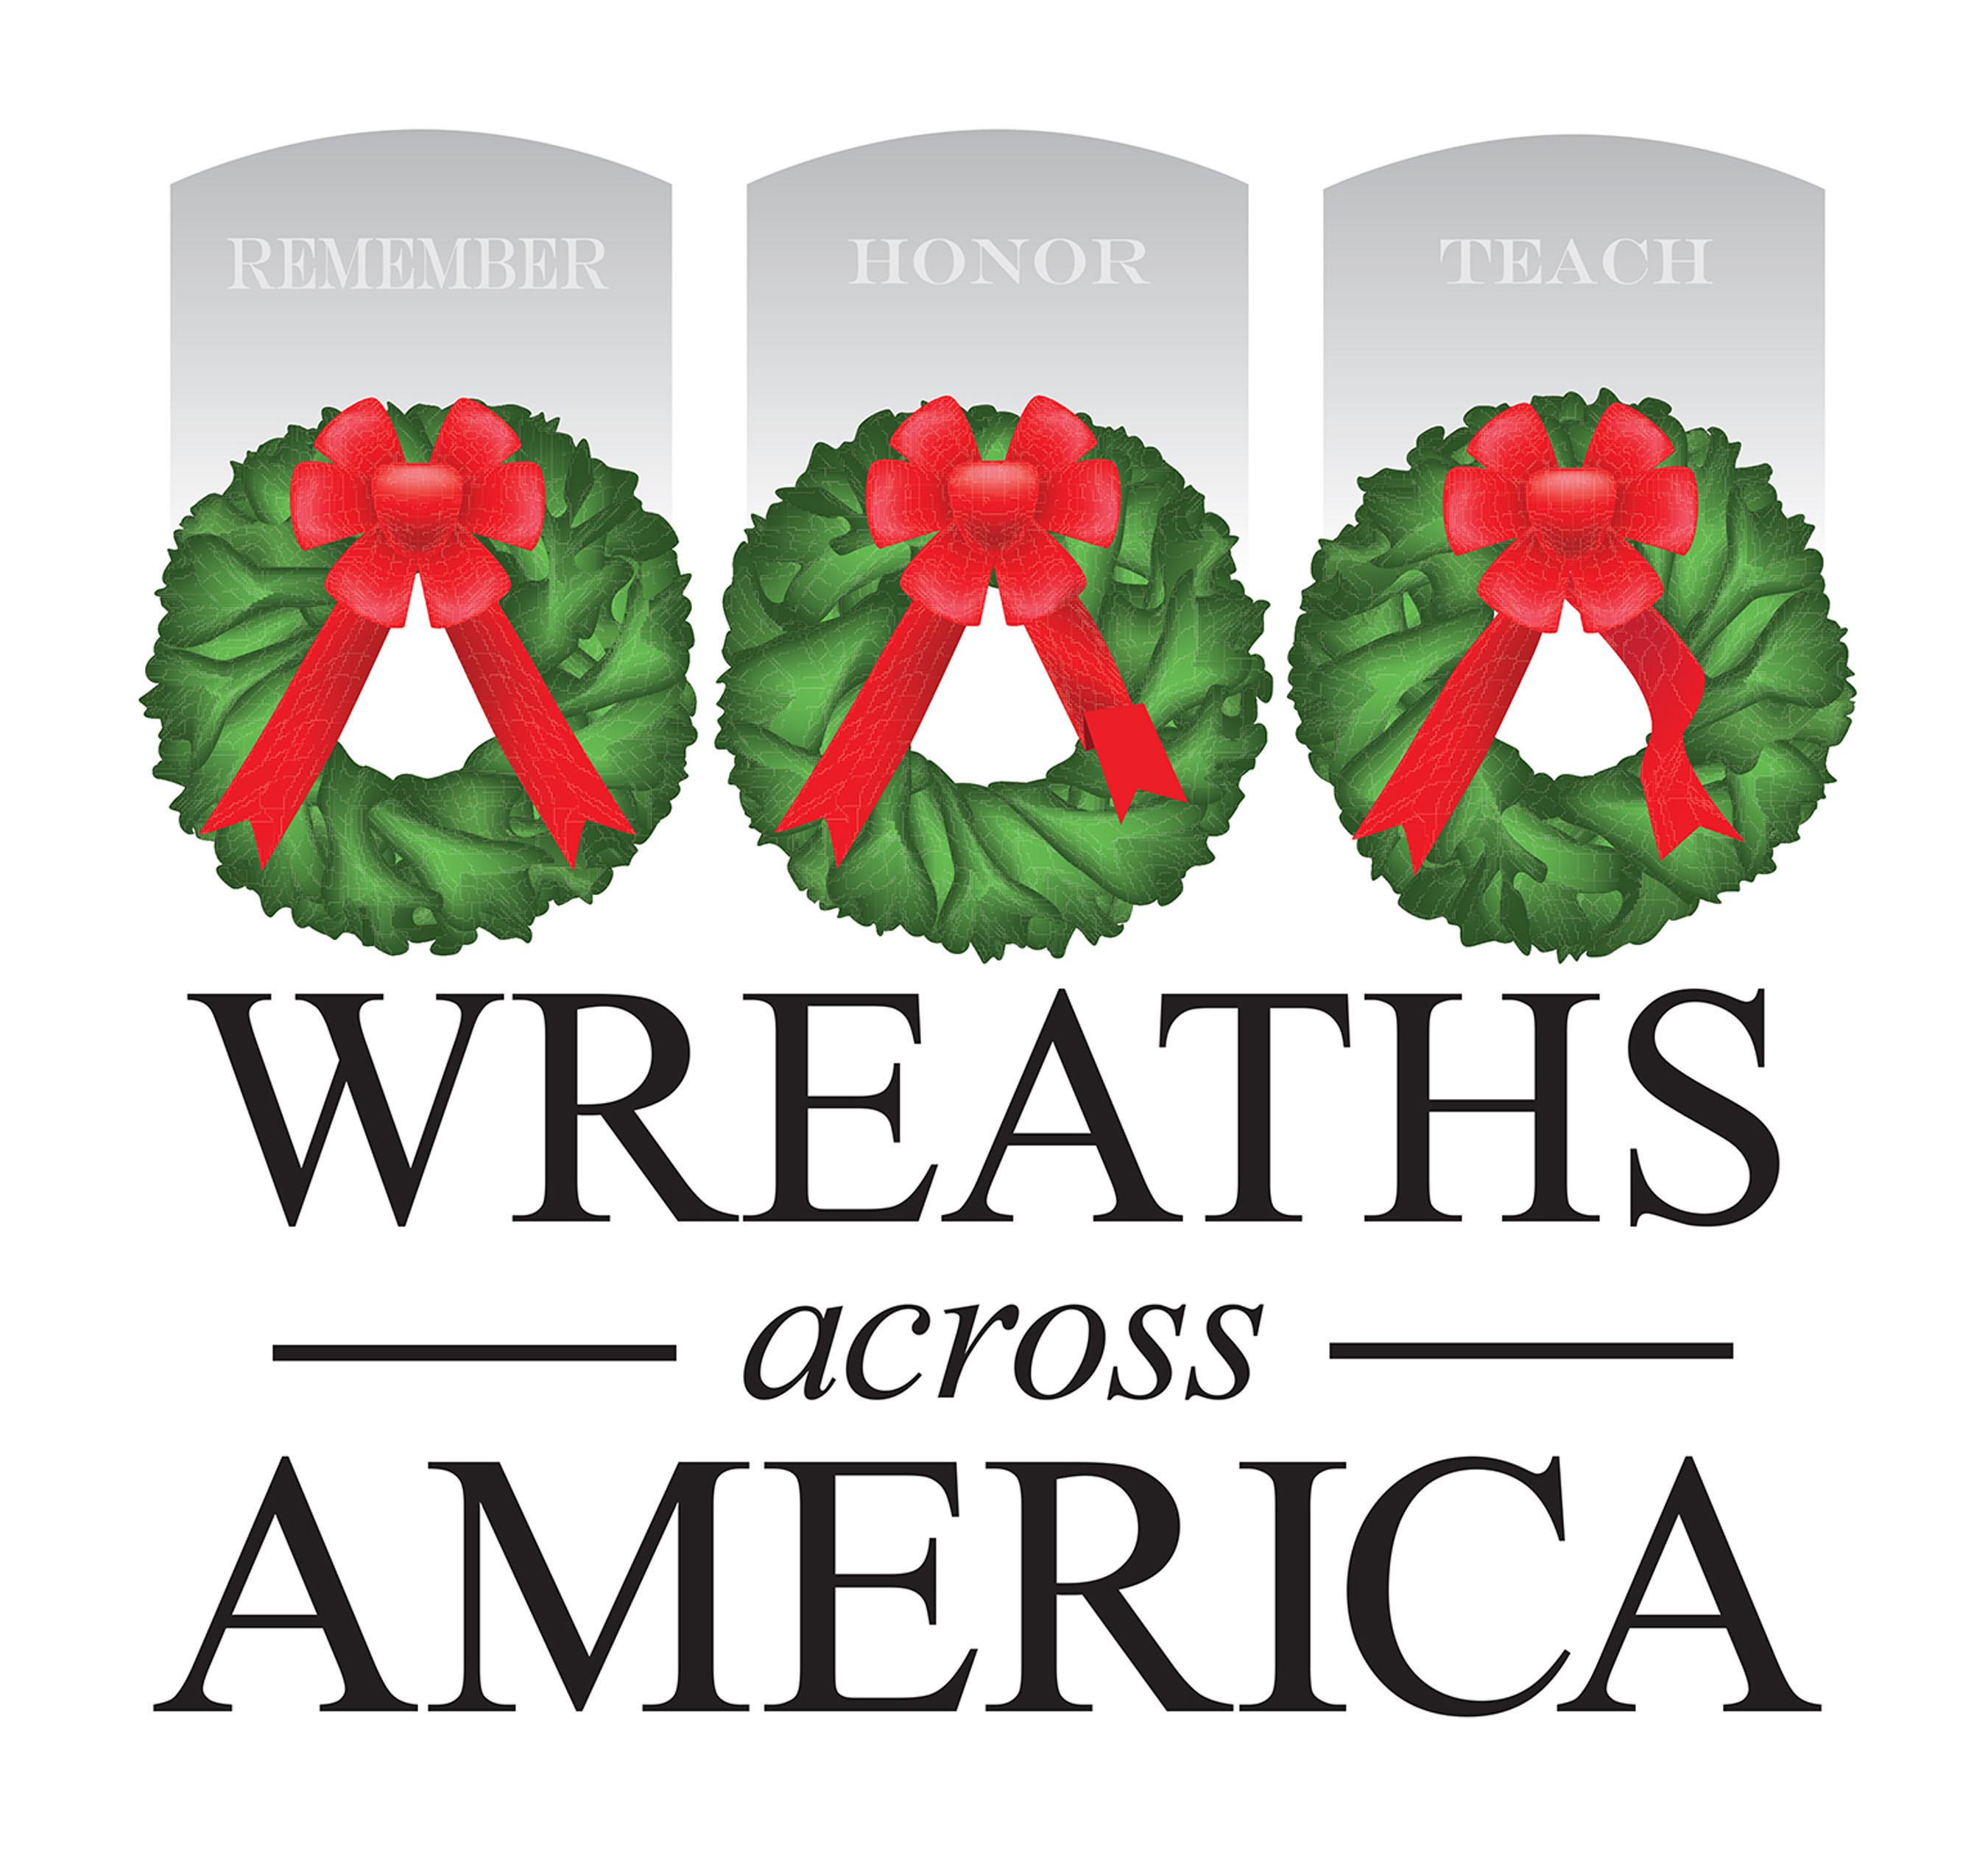 www.wreathsacrossamerica.org . (PRNewsFoto/Wreaths Across America) (PRNewsFoto/Wreaths Across America)